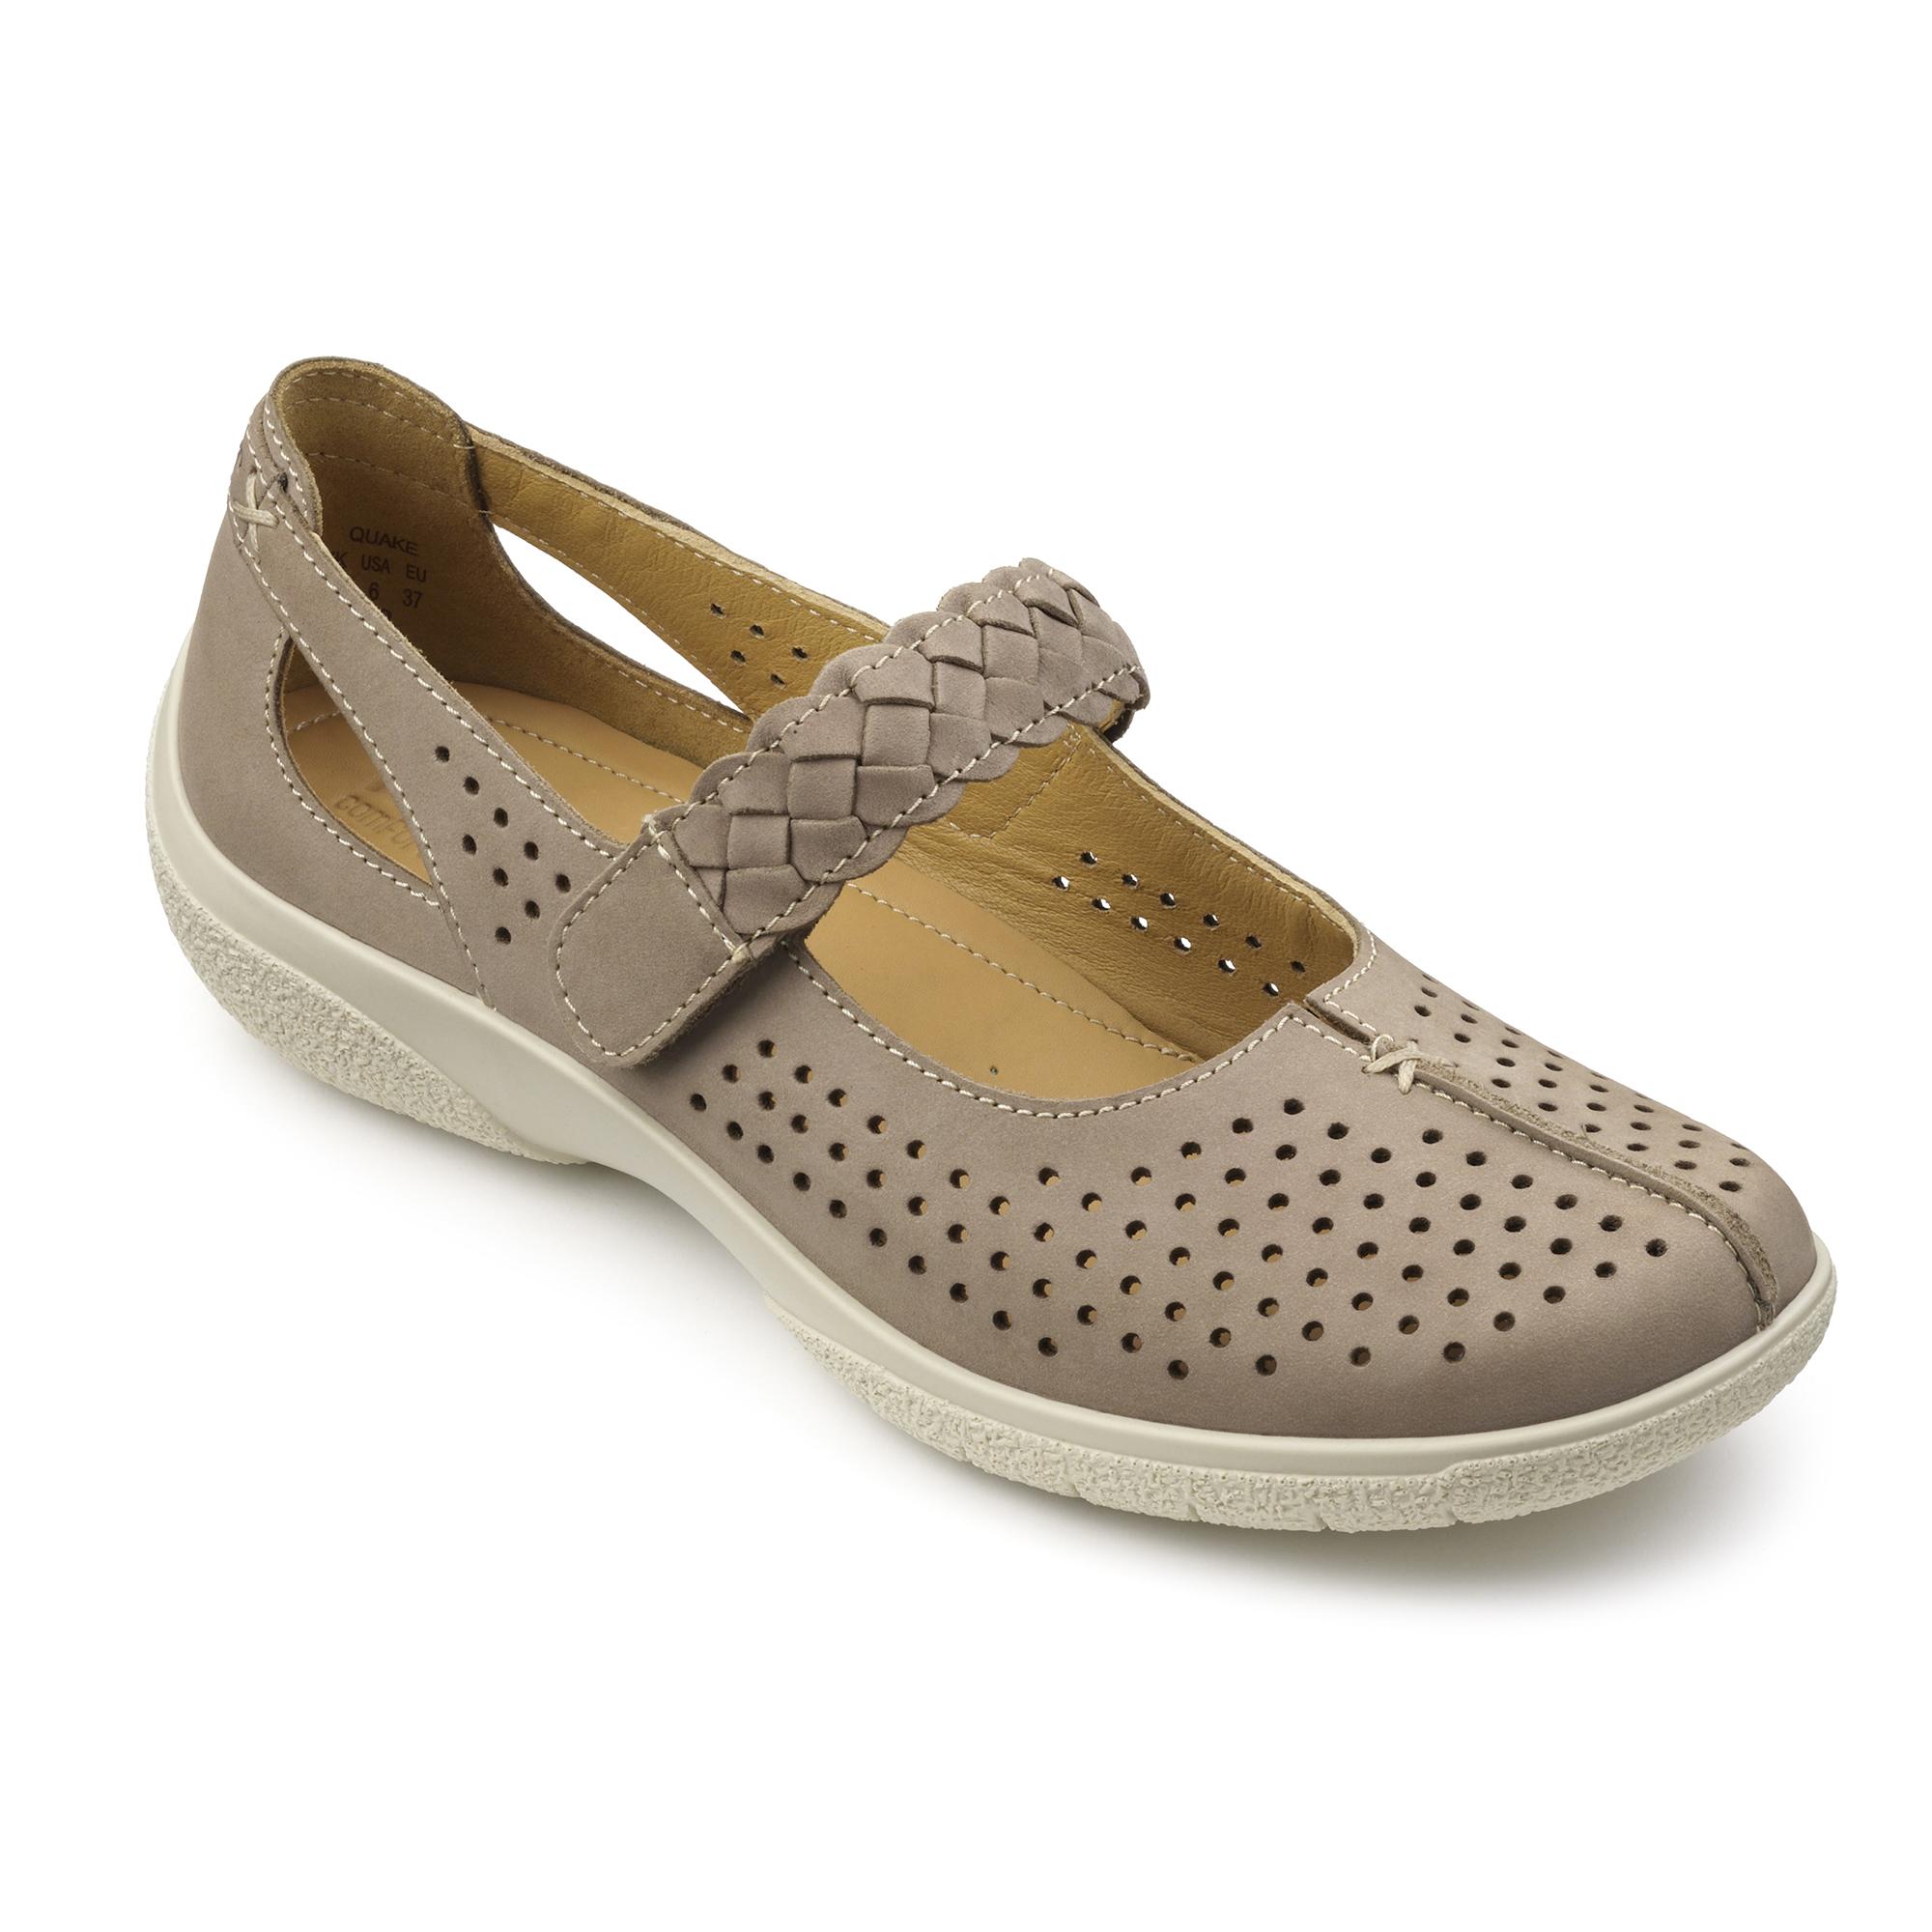 Hotter-Mujer-Quake-Senoras-Casual-Zapatos-Calzado-Zapatillas-Cuero